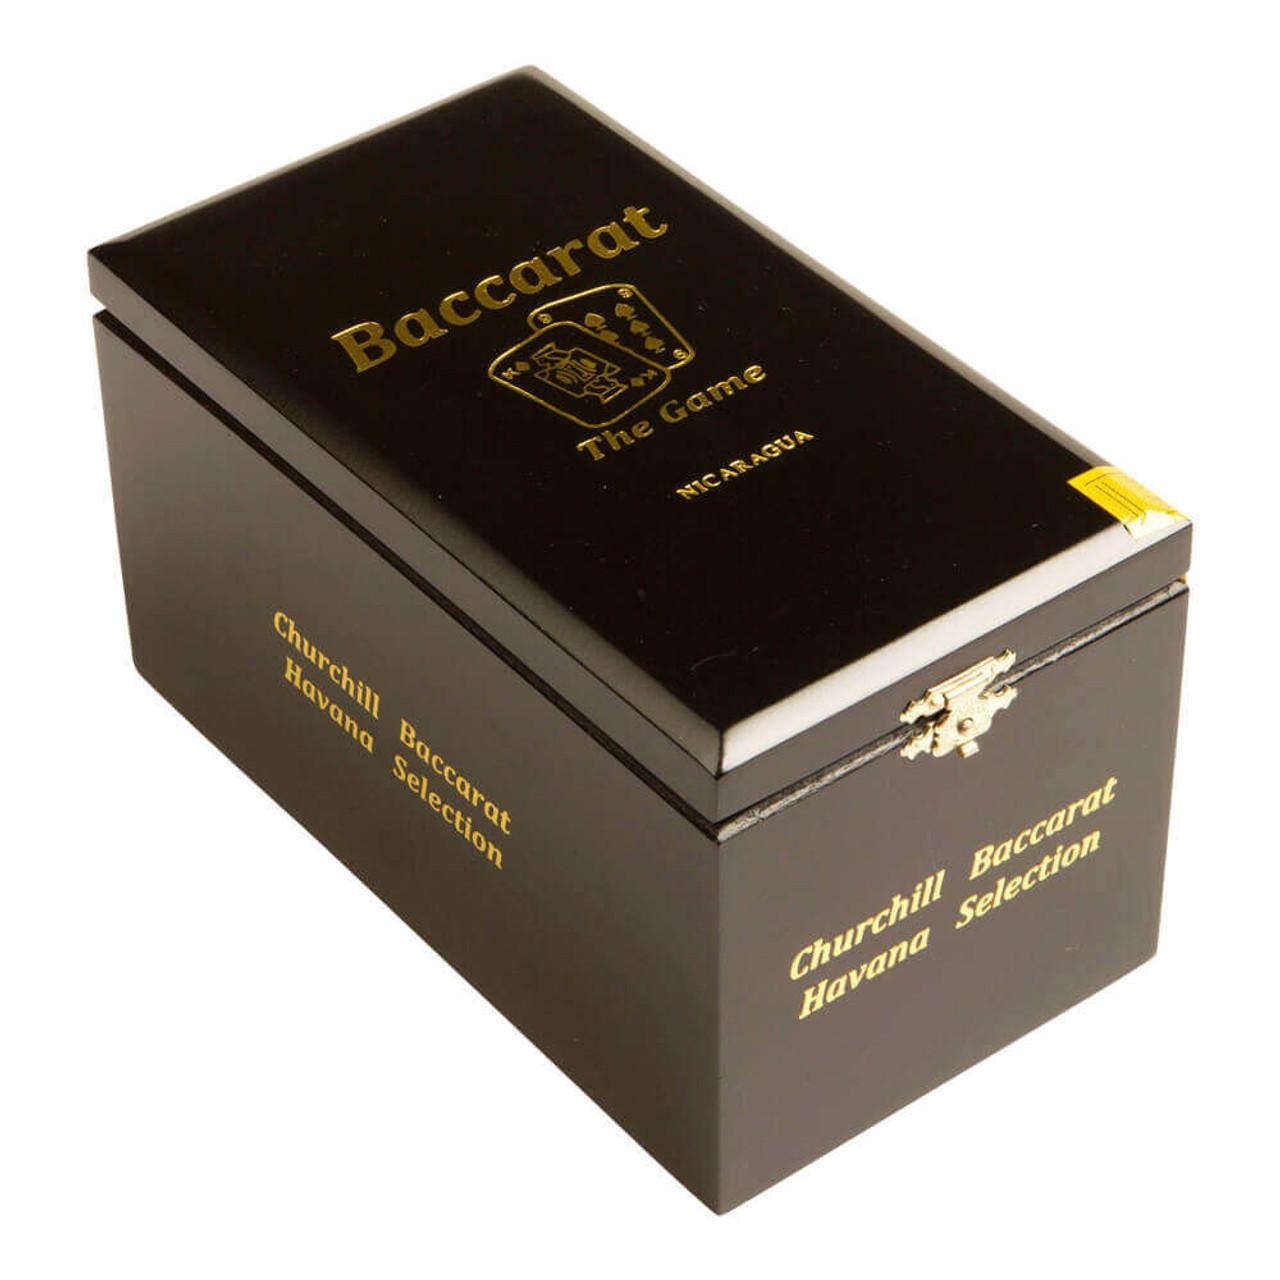 Baccarat Nicaragua Churchill Cigars - 7 x 50 (Box of 25)